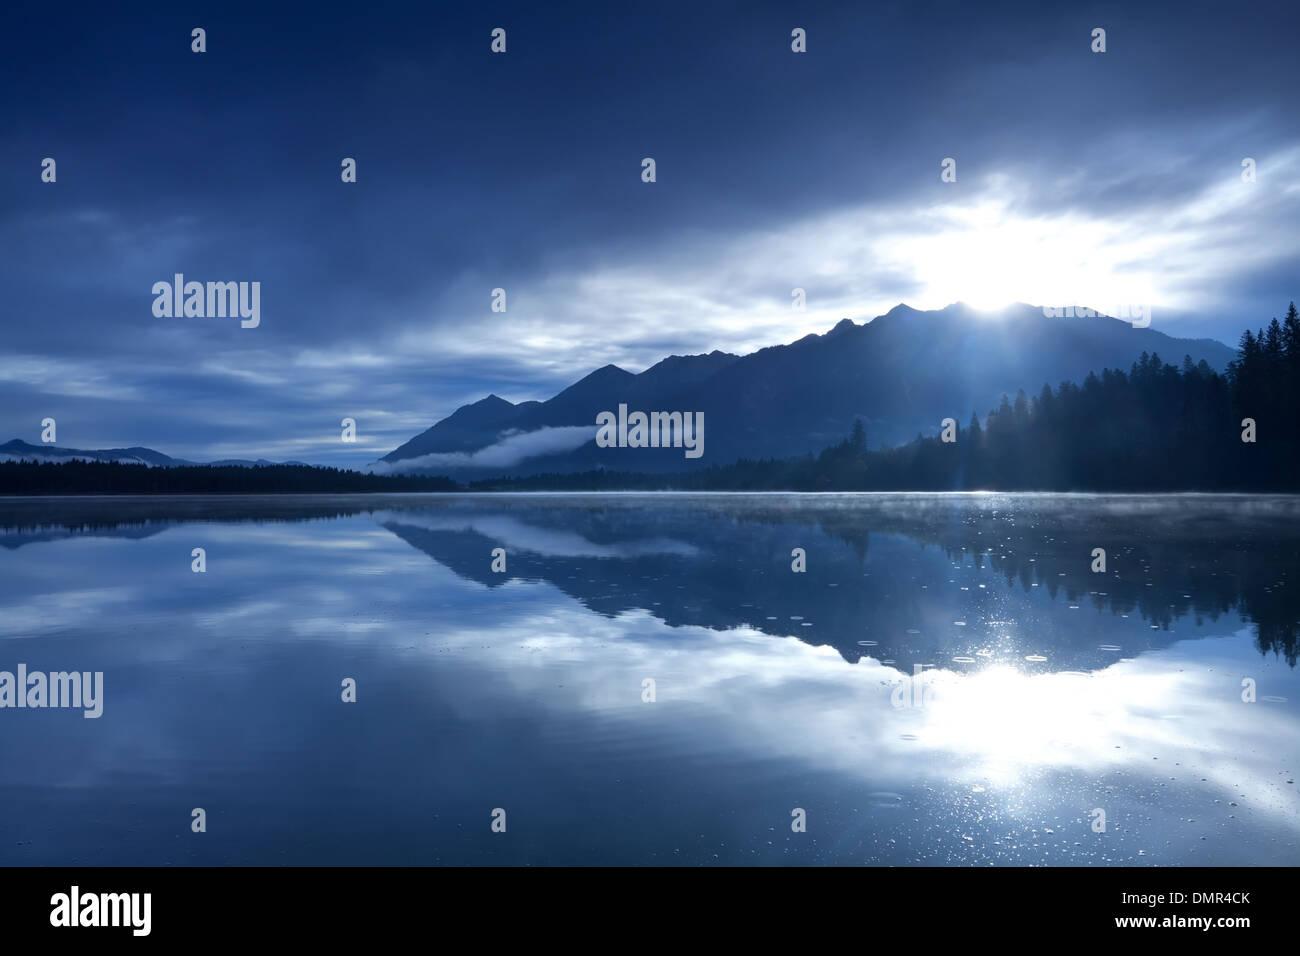 sunshine over mountains and alpine lake, Bavaria, Germany - Stock Image